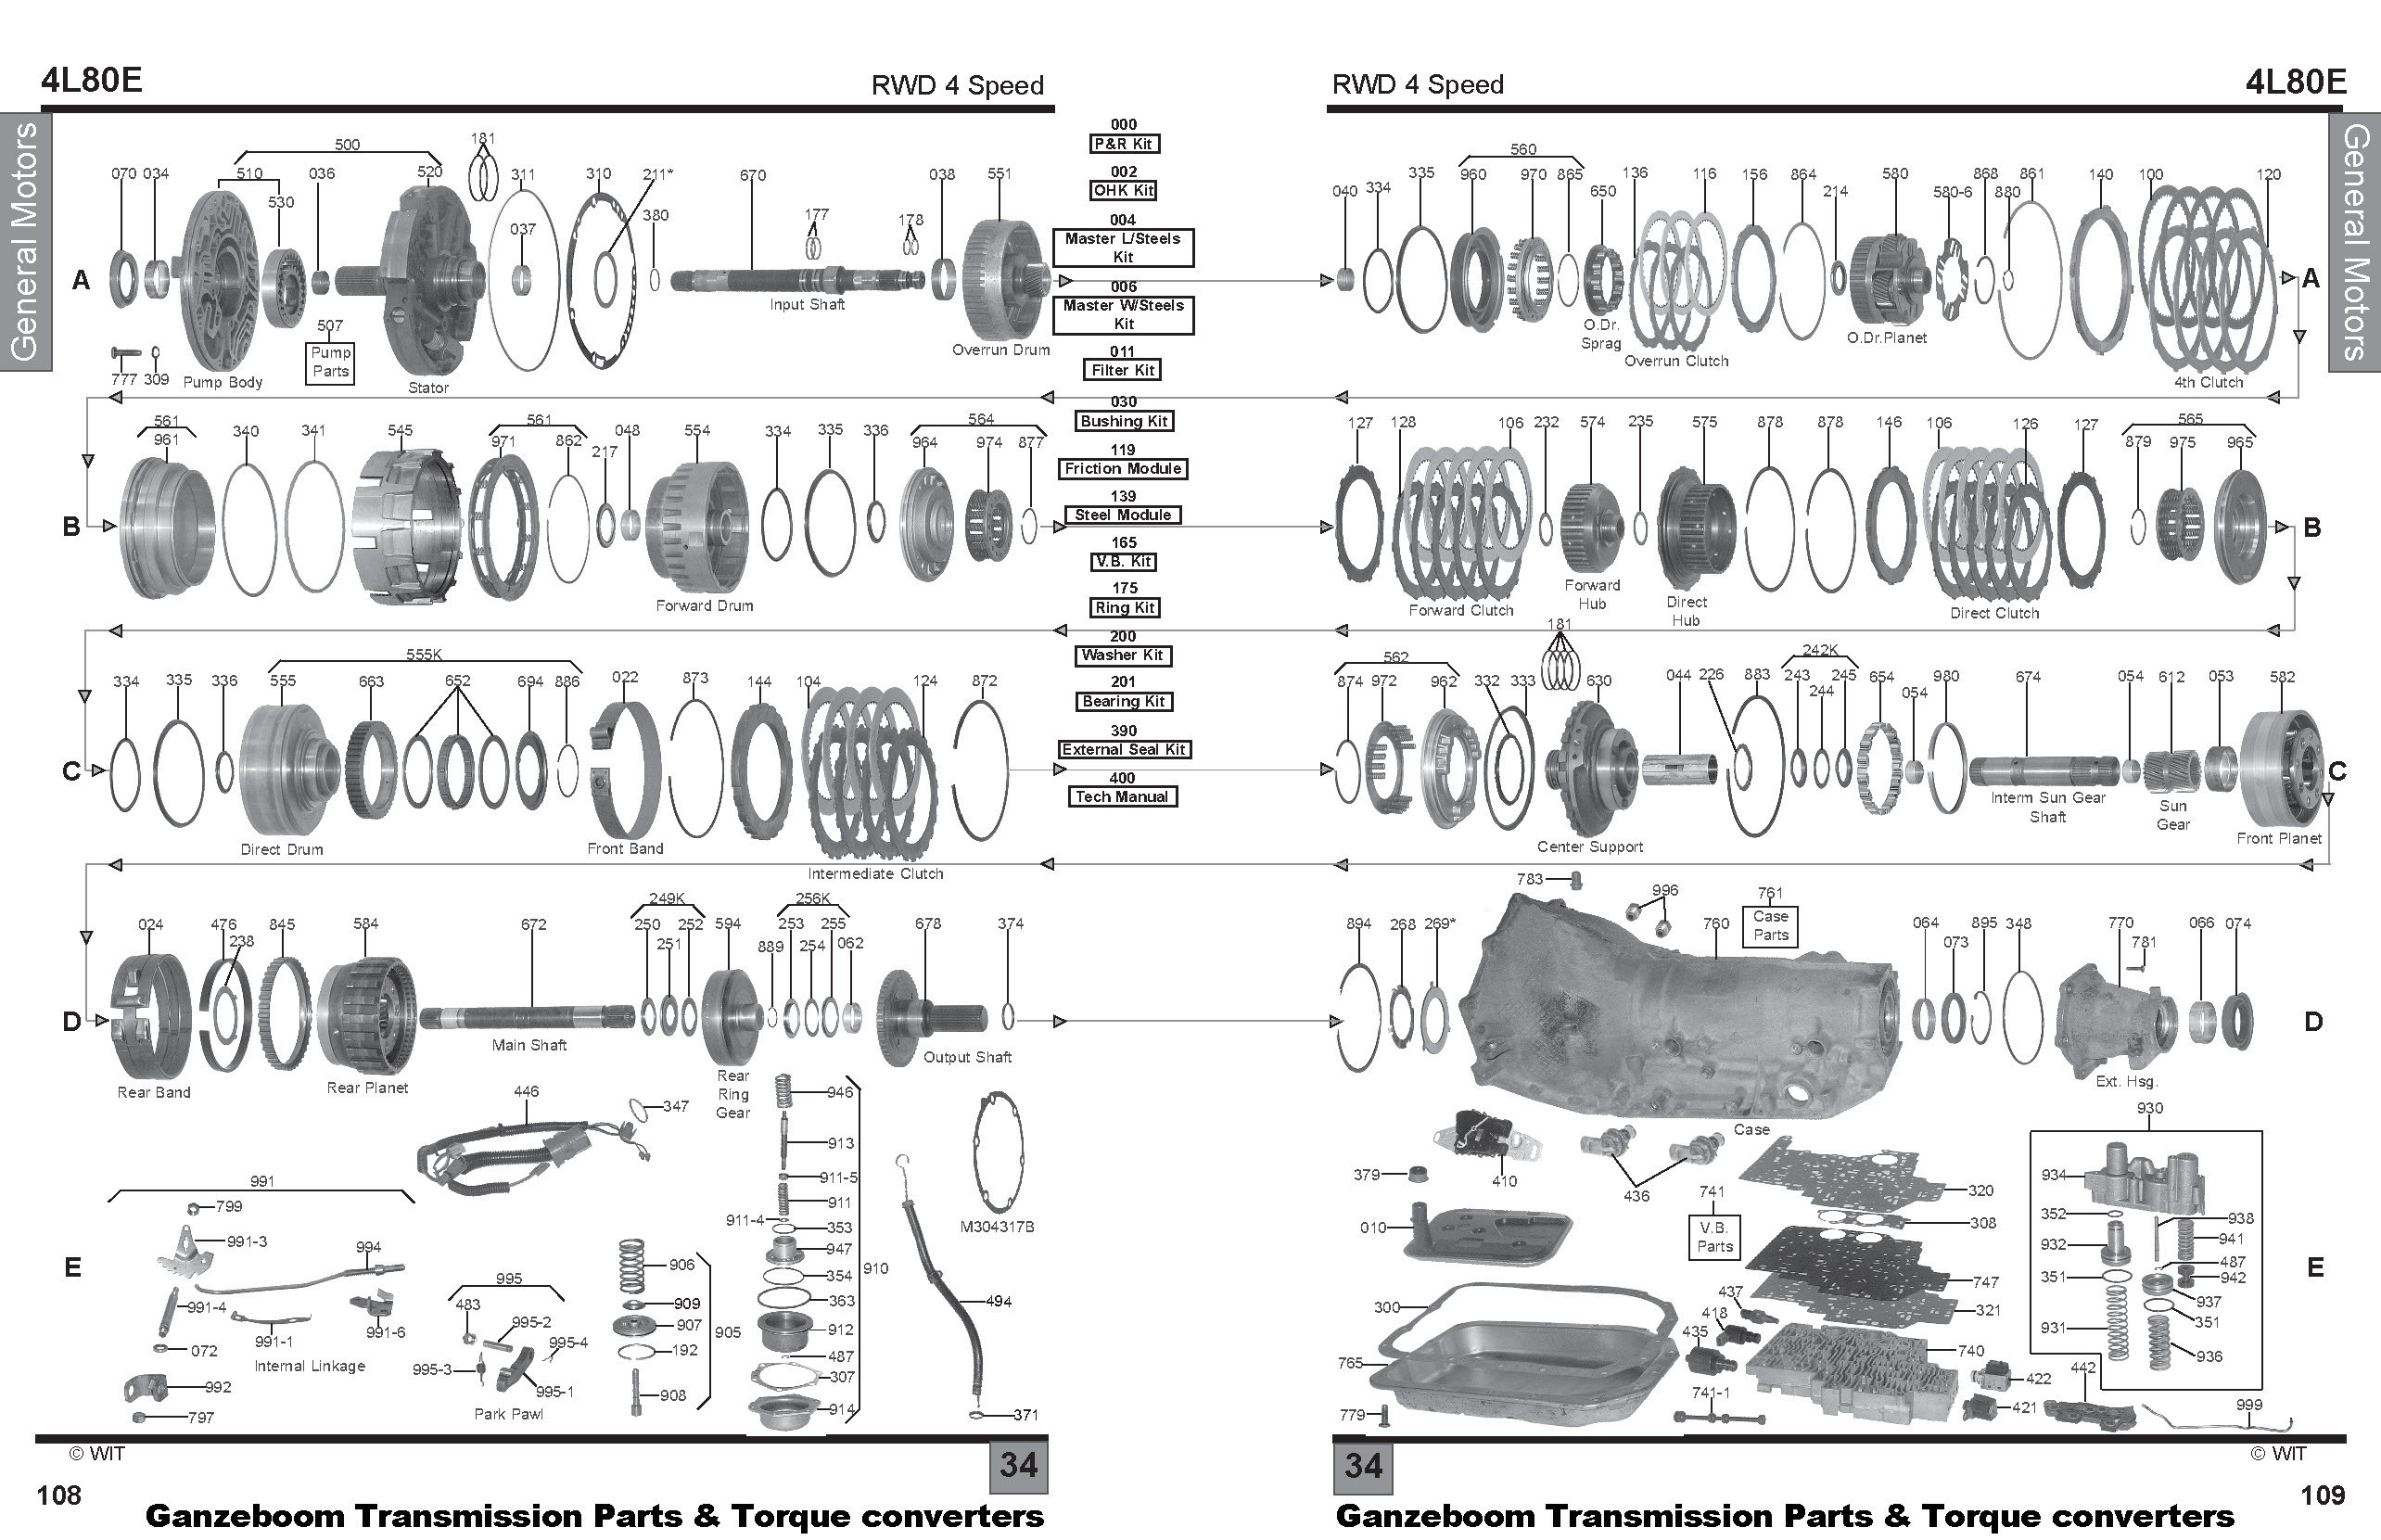 4l80e Transmission Parts Diagram 4l80e Of 4l80e Transmission Parts Diagram